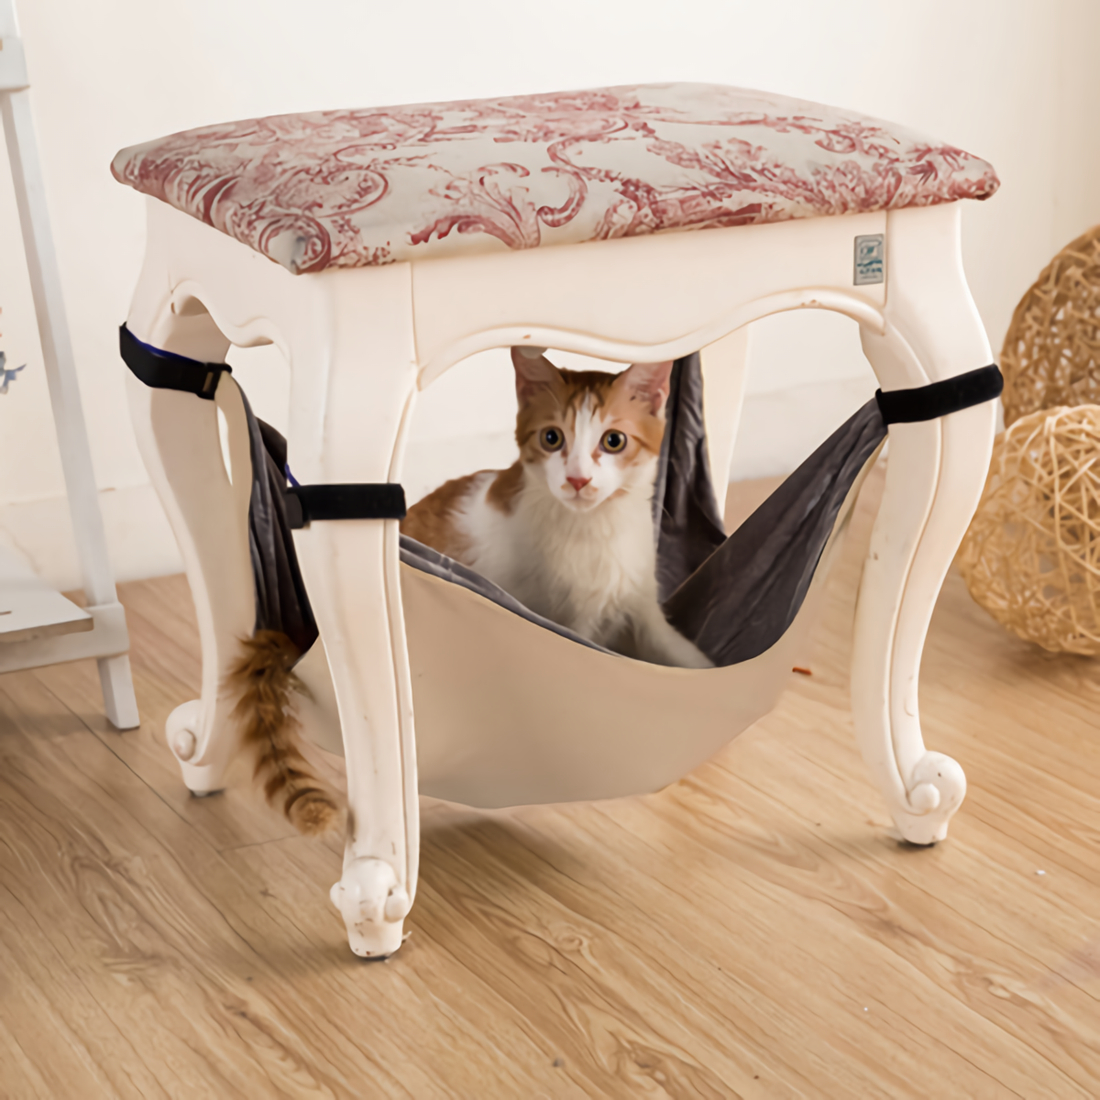 Cat Hammock Bed Comfortable Hanging Pet Hammock Bed For